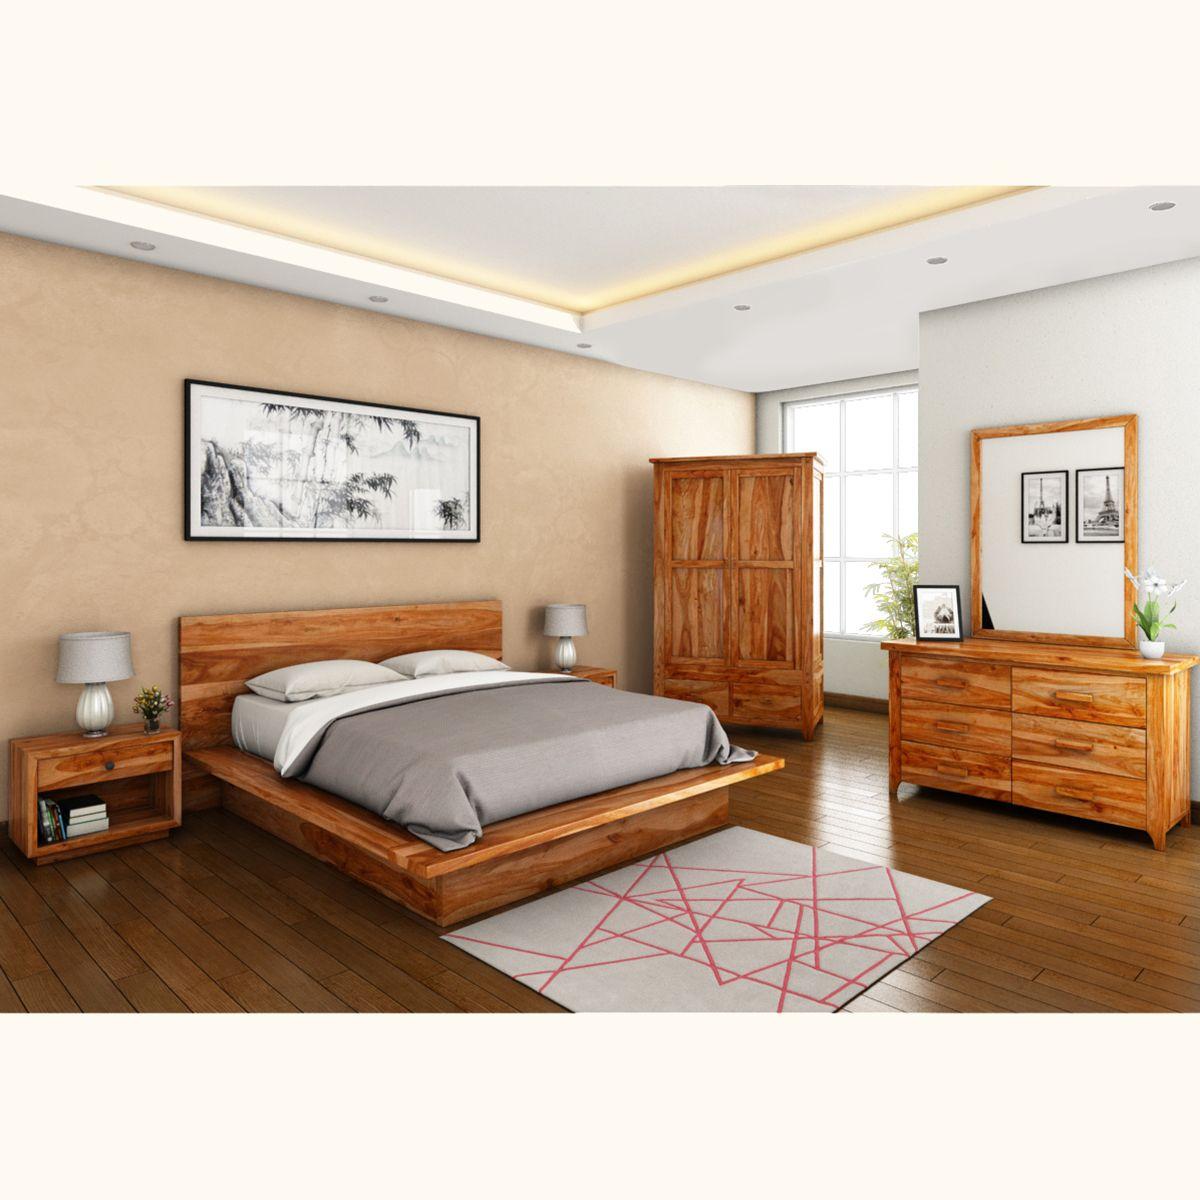 Real Wood Bedroom Sets Bedroom Curtains And Matching Bedding Bedroom Under Eaves Master Bedroom Bed: Delaware 6 Piece Bedroom Set In 2019